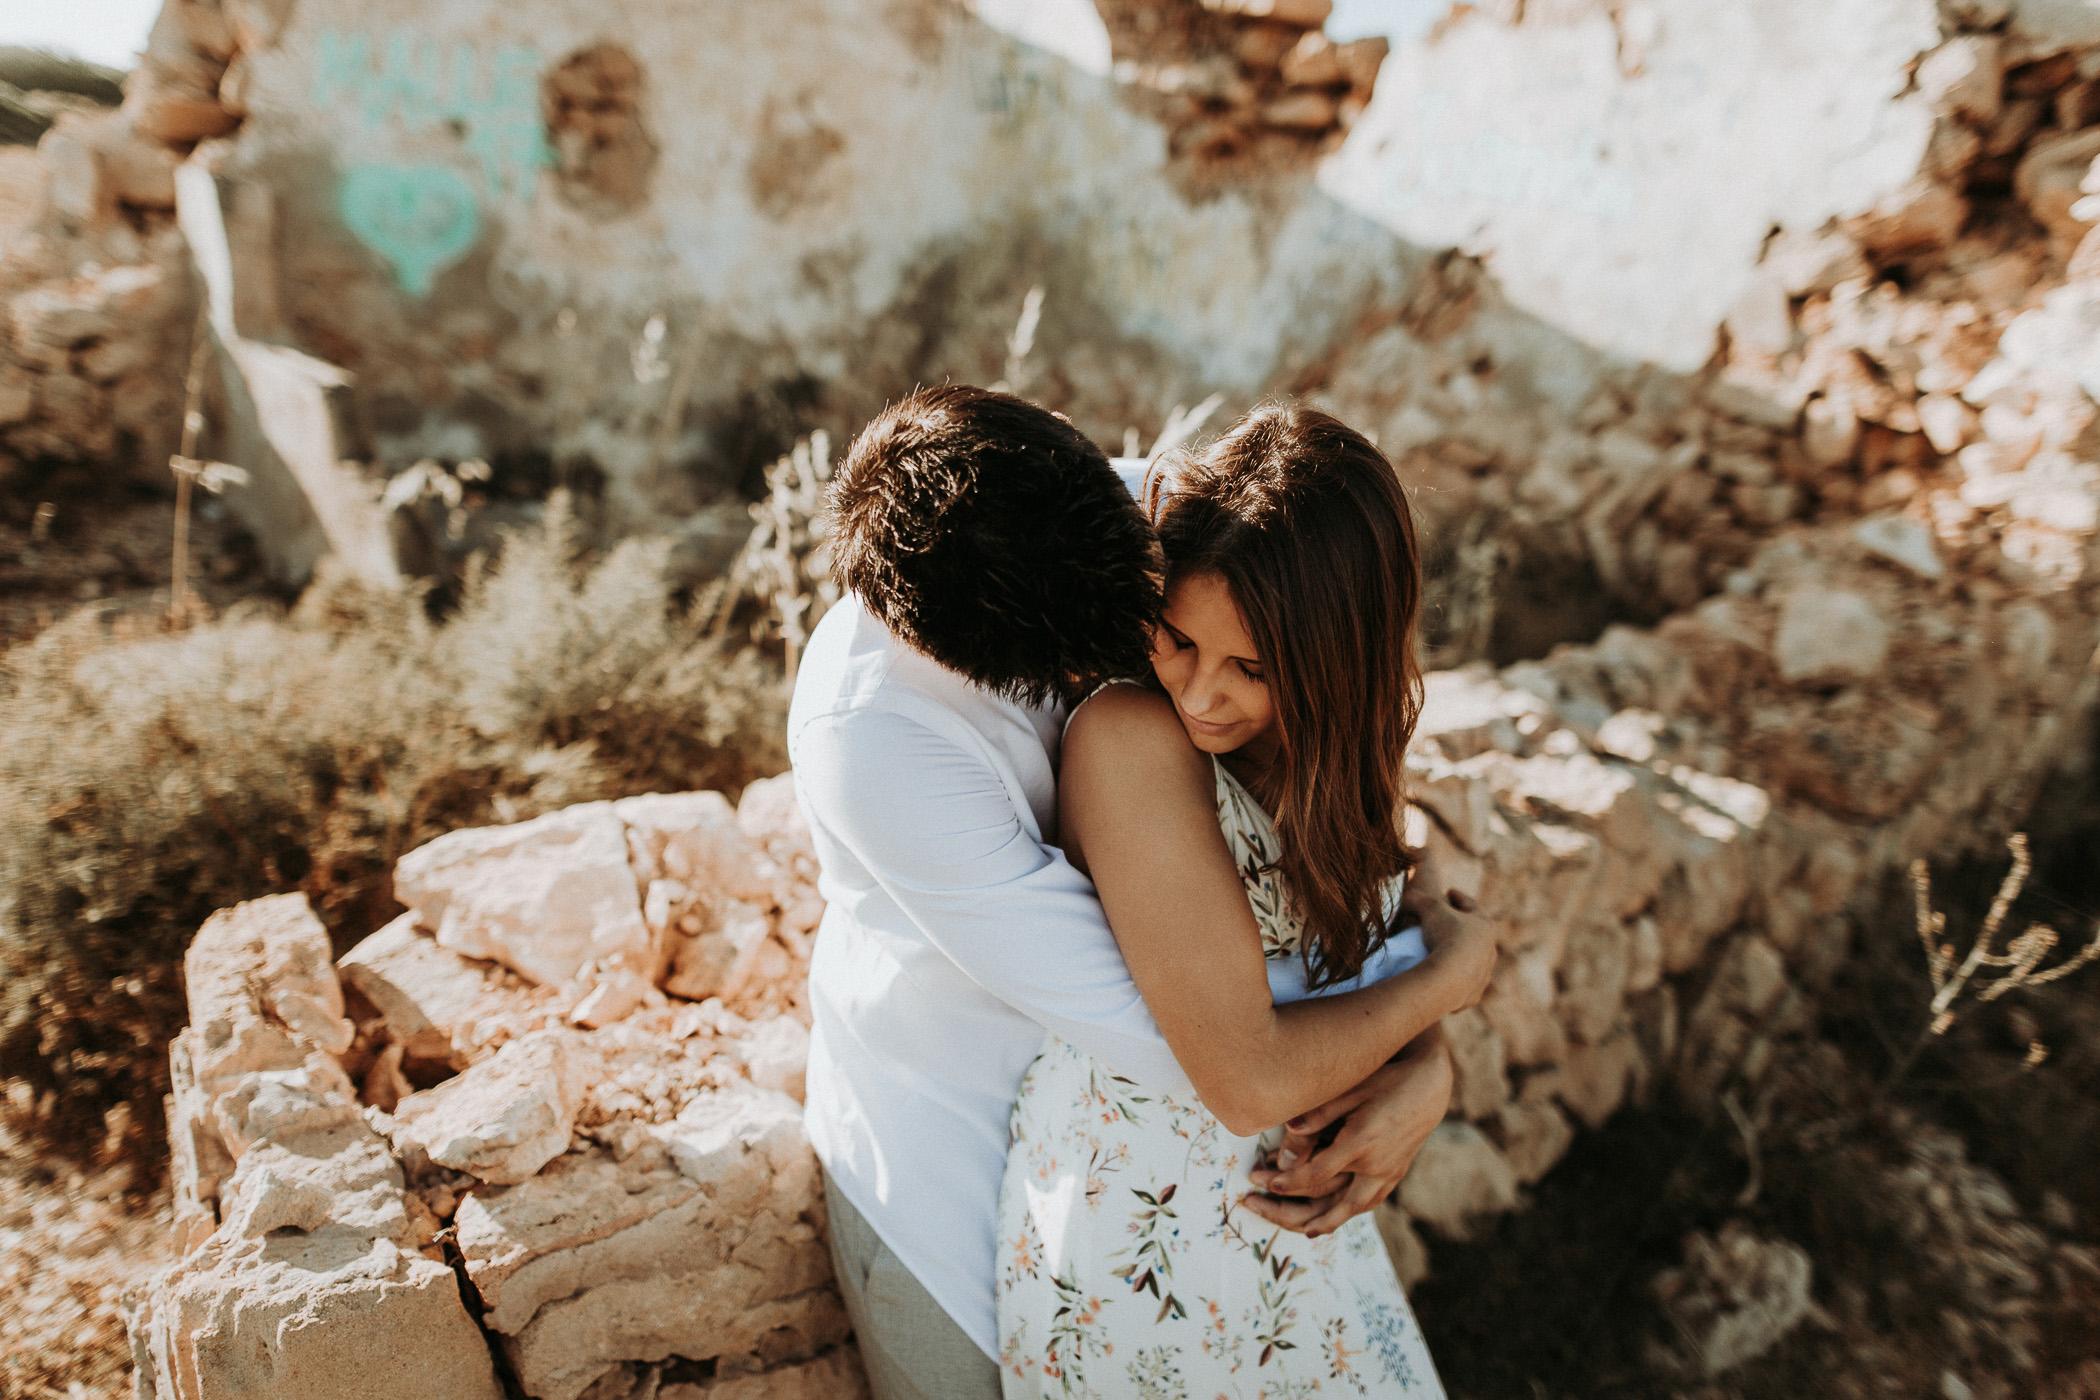 DanielaMarquardtPhotography_wedding_elopement_mallorca_spain_calapi_palma_lauraandtoni_381